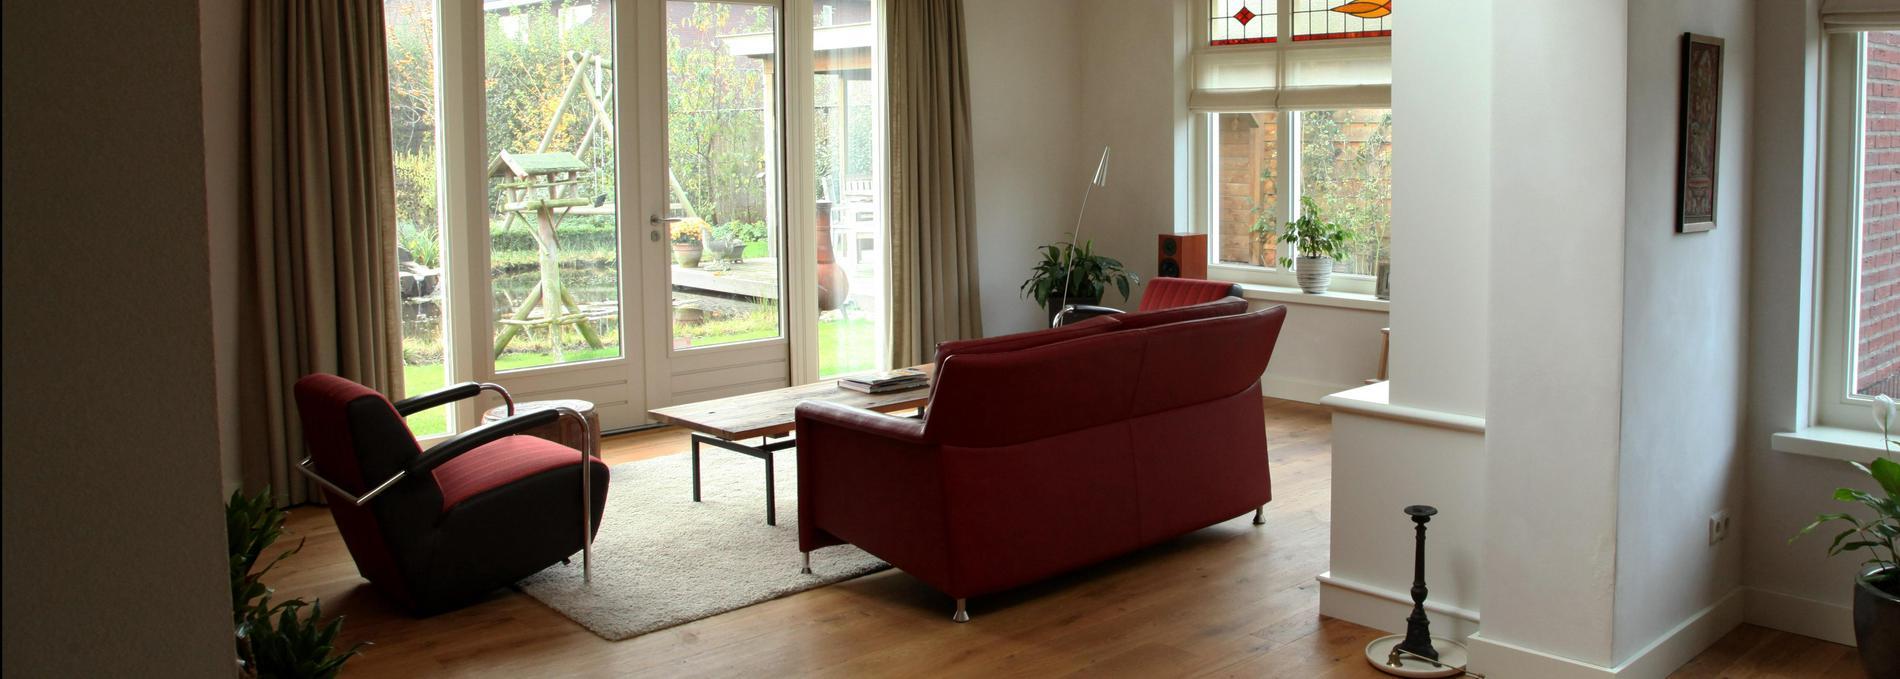 Kathshuis - Onderzoek planvorming uitbouw woonkamer.